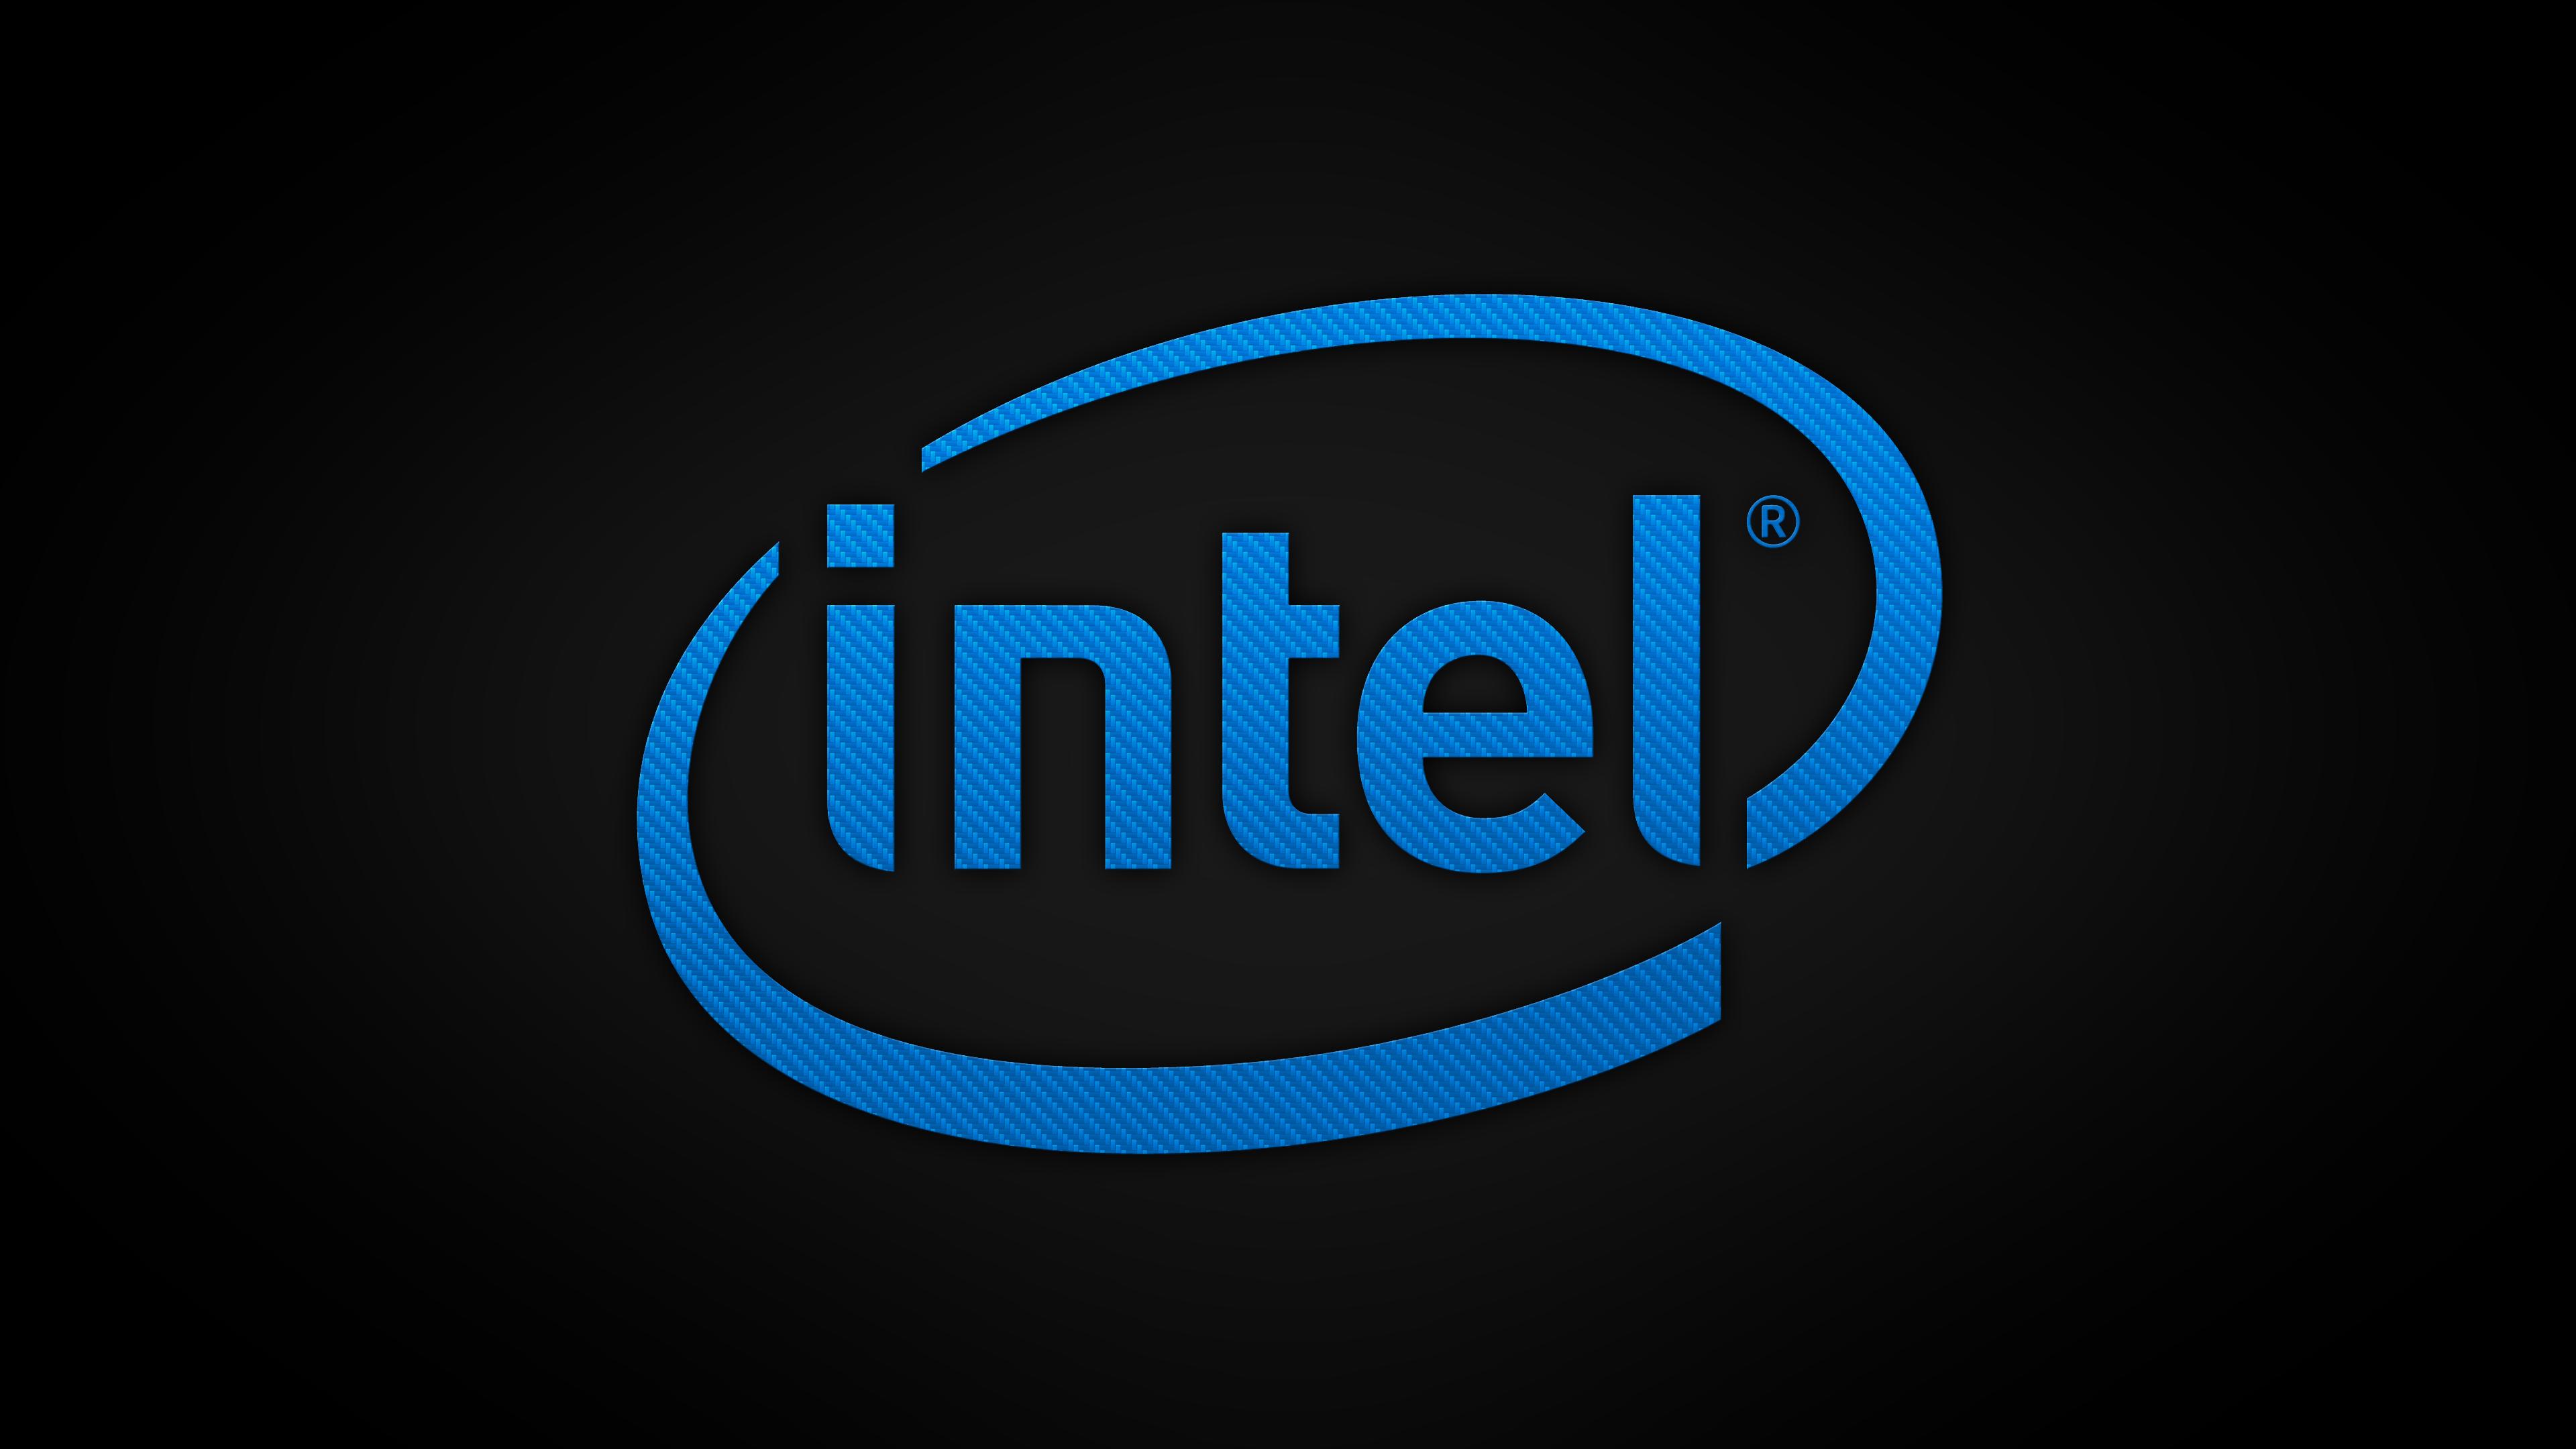 Intel 4k Desktop Wallpapers Top Free Intel 4k Desktop